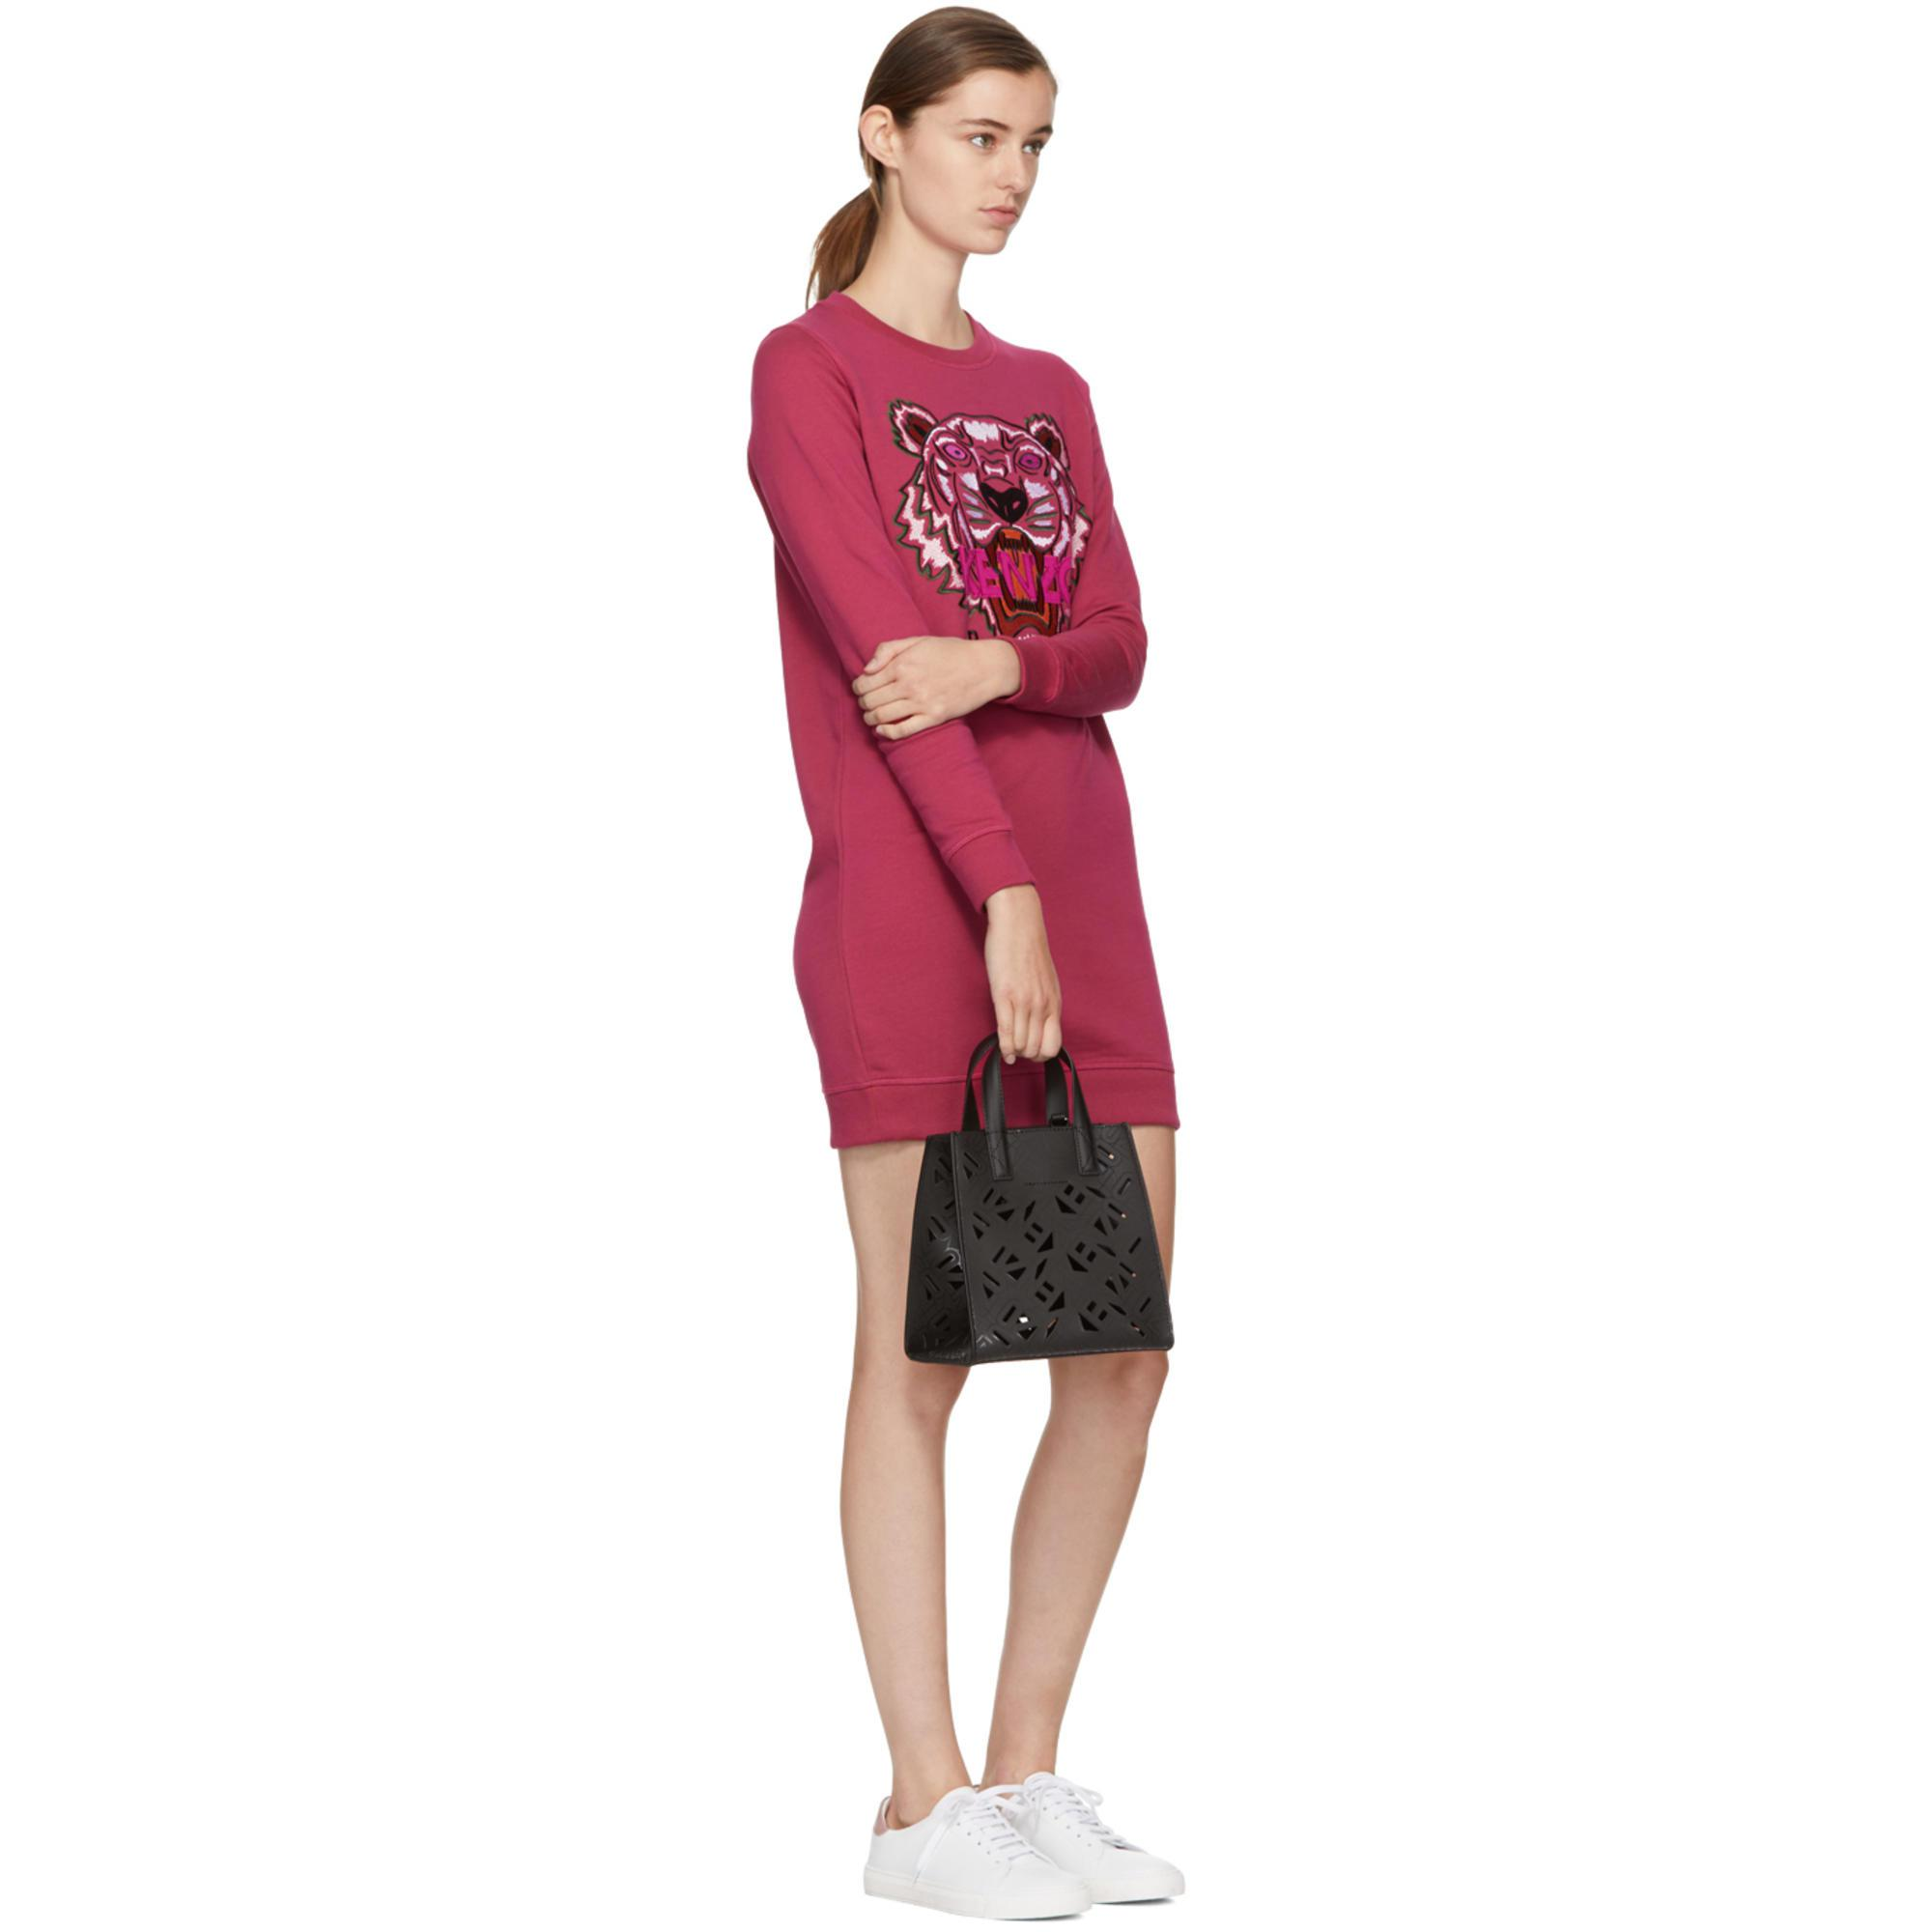 00f17d7e0bc Lyst - Robe pull rose Tiger KENZO en coloris Rose